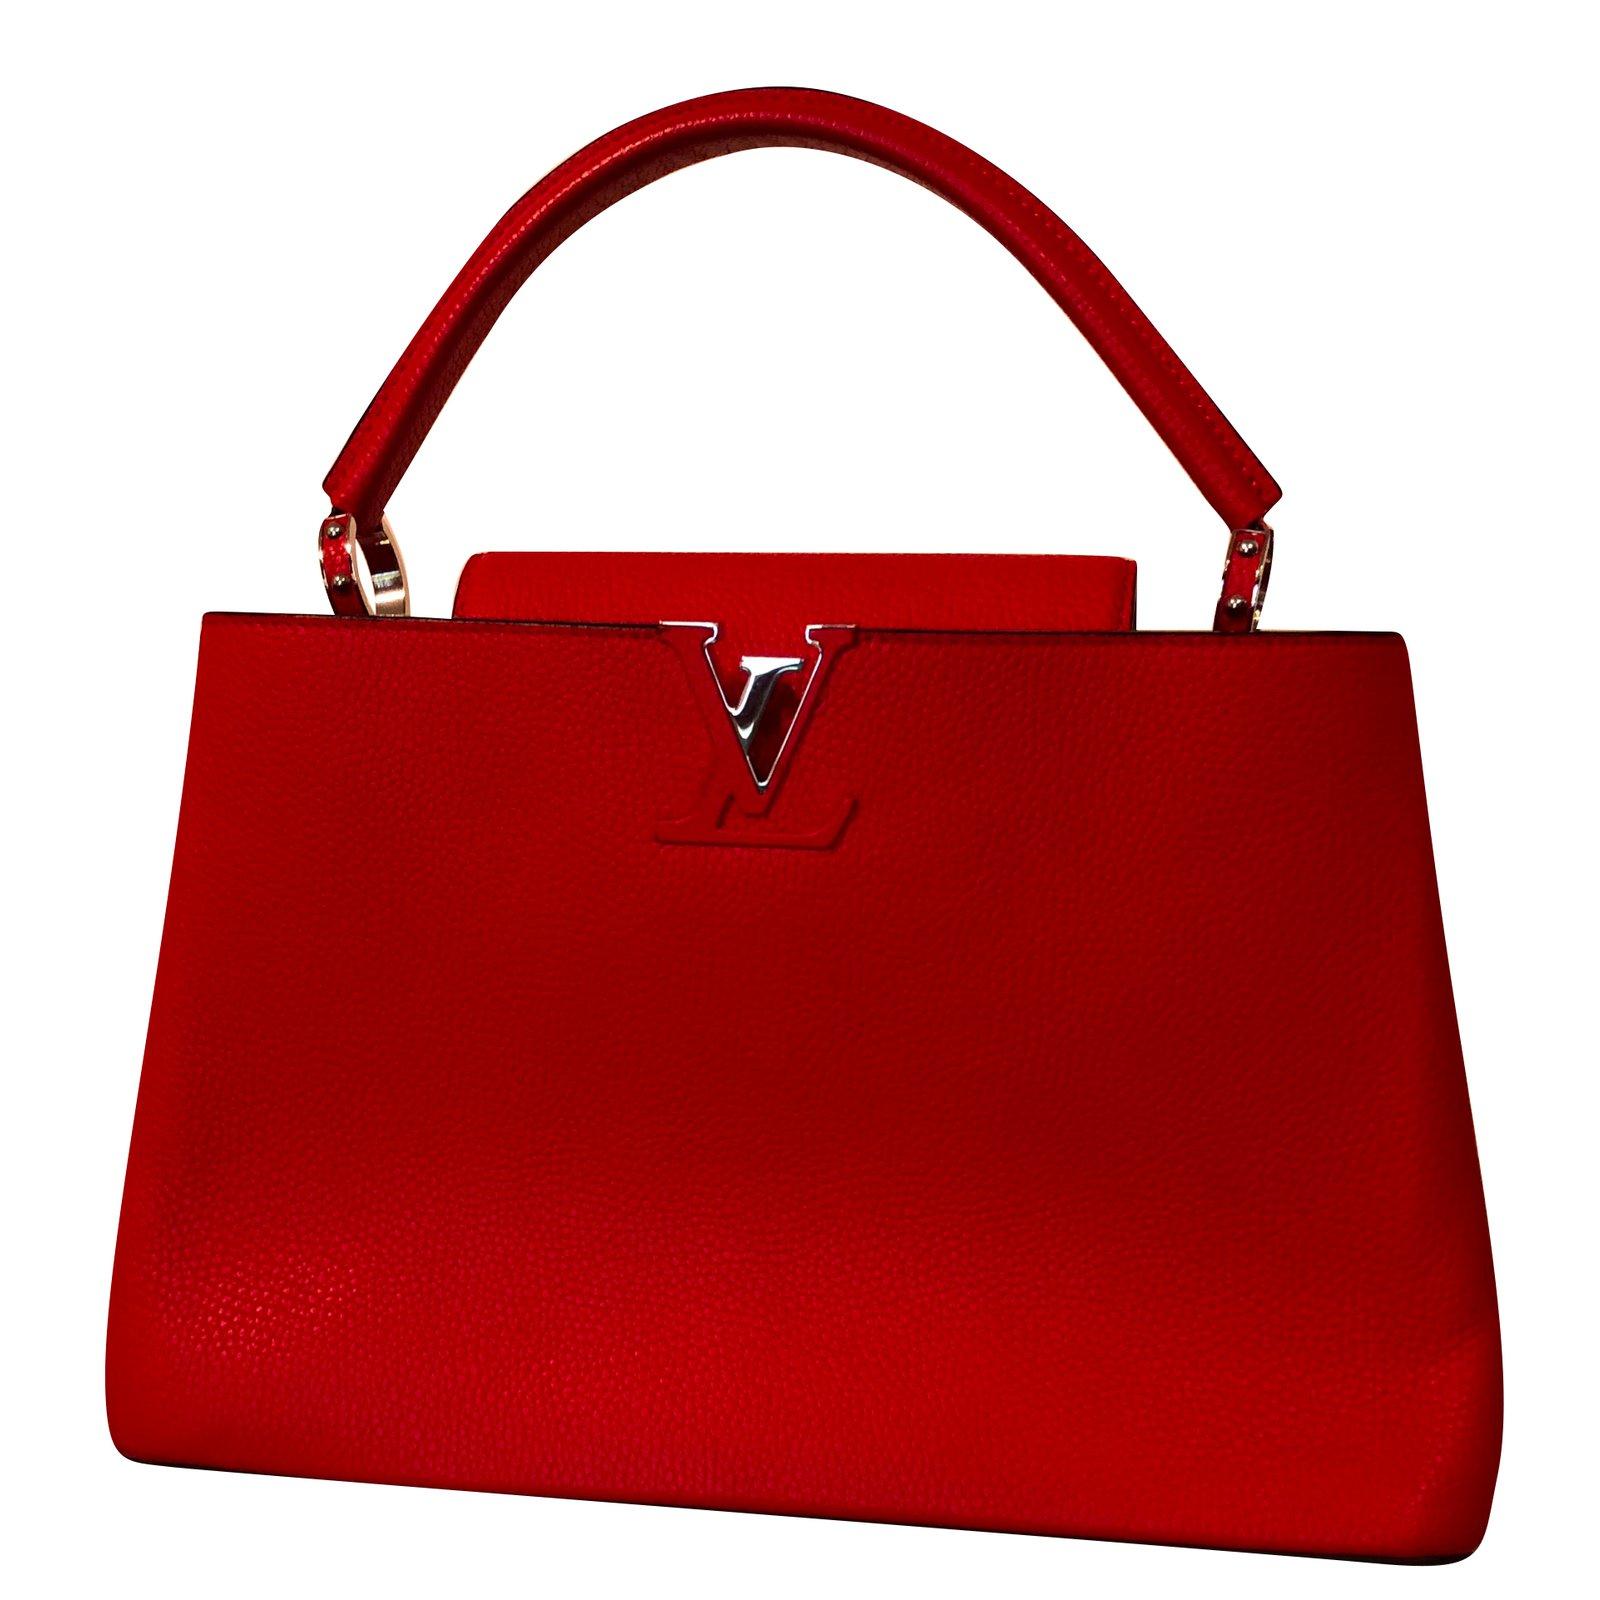 b7765cc6e5 Sacs à main Louis Vuitton Sacs à main Cuir Rouge ref.79112 - Joli Closet